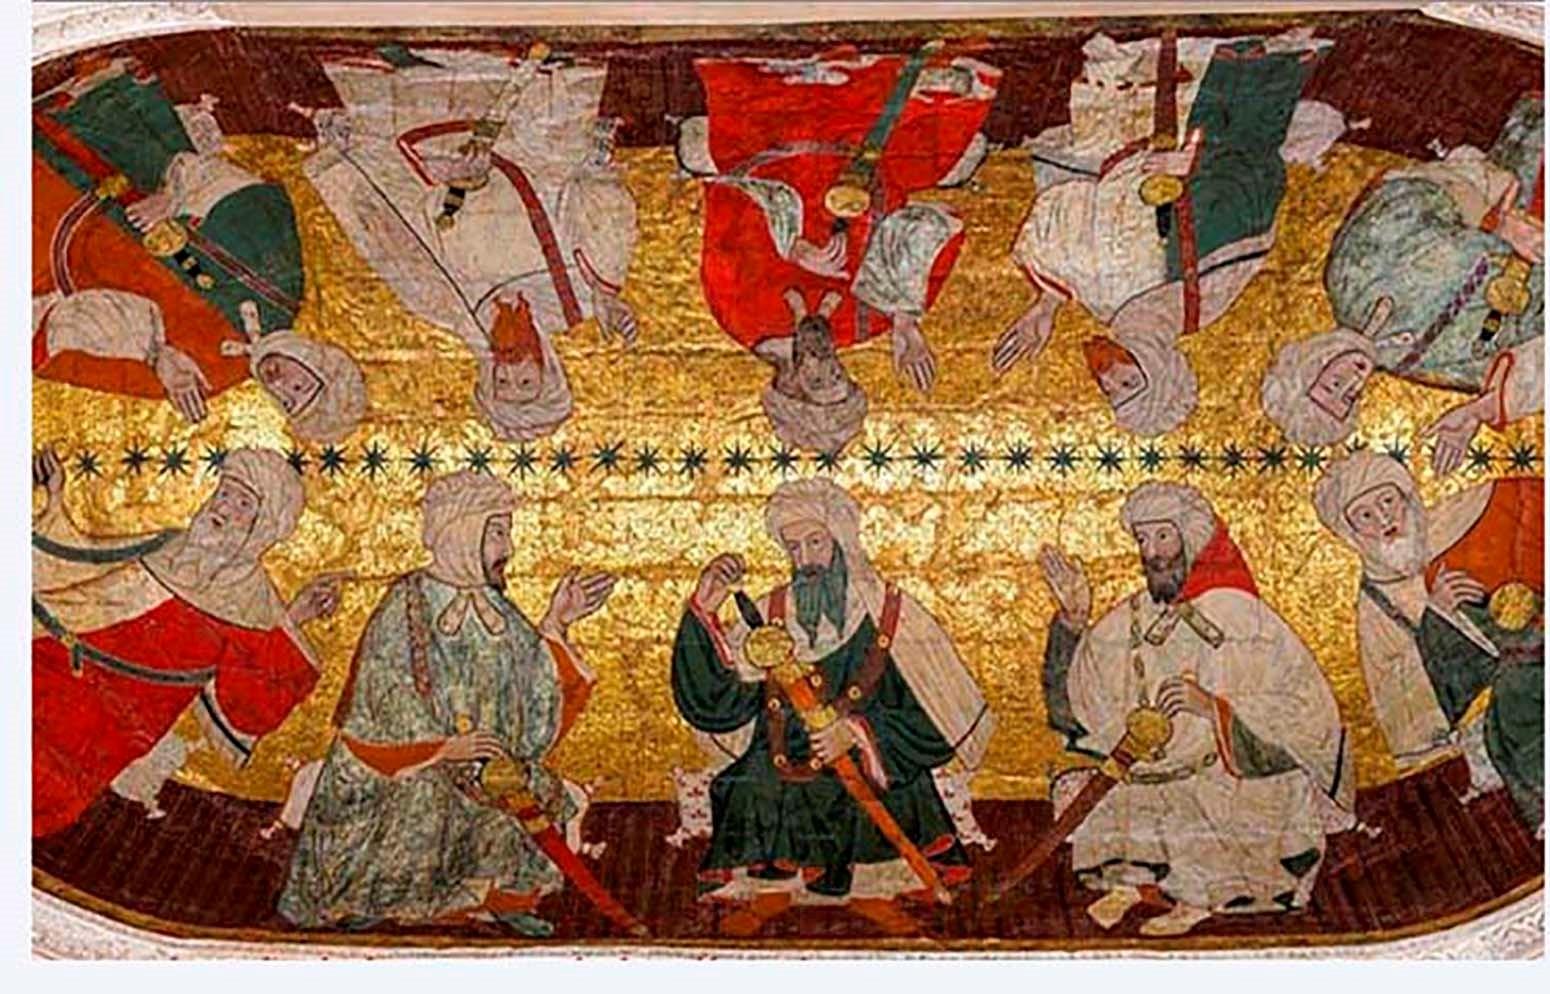 Bóveda Sala de los Reyes. La Alhambra.